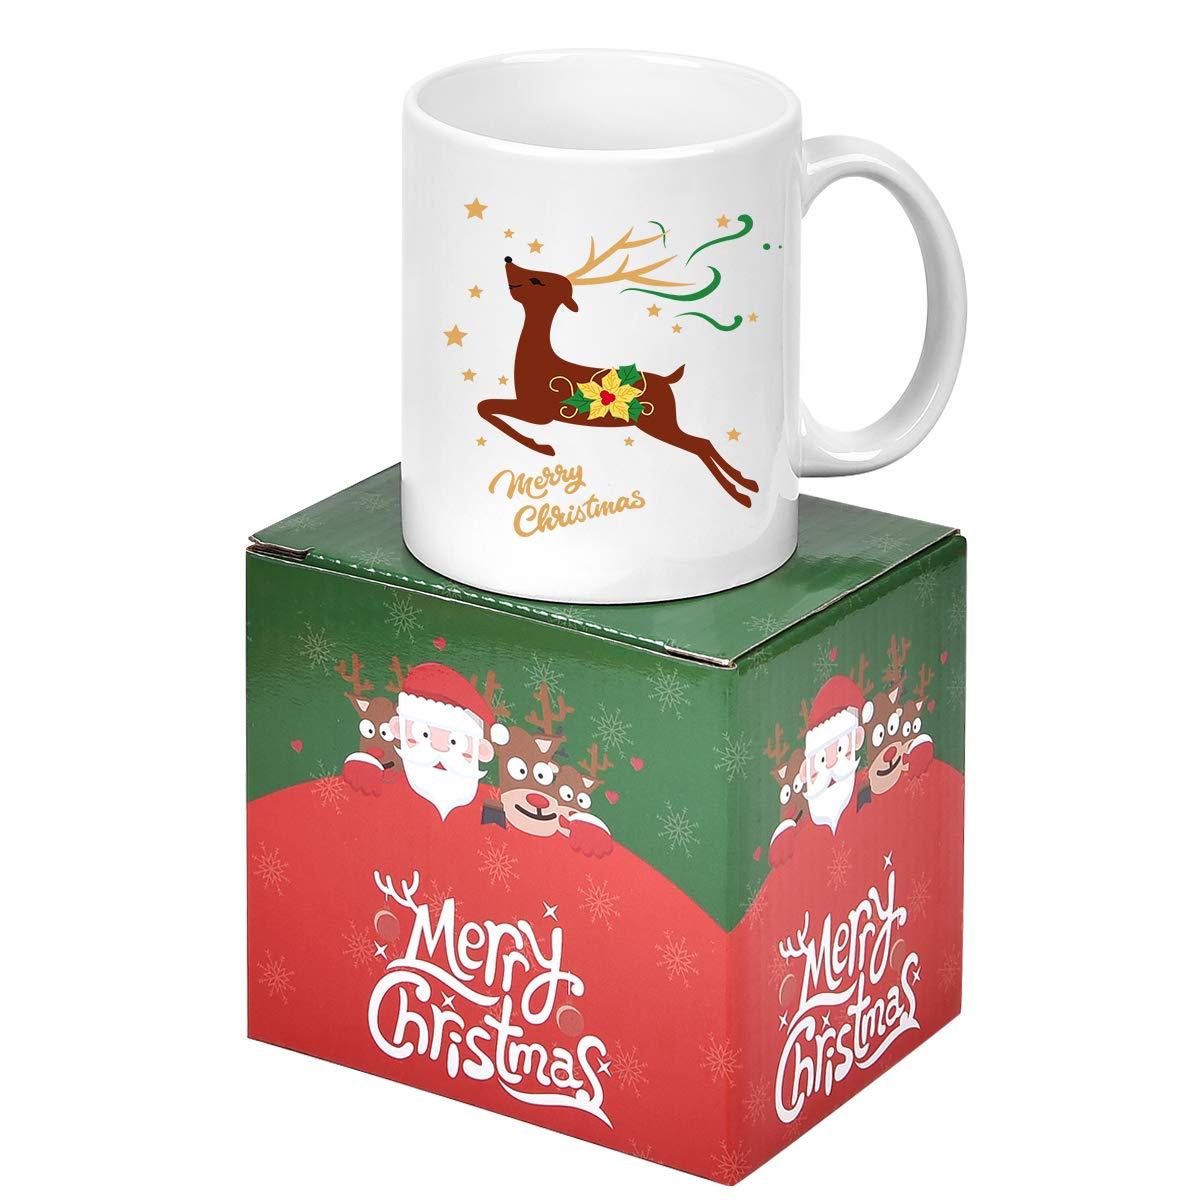 Funny Christmas Coffee Mug Merry Christm Buy Online In Burkina Faso At Desertcart